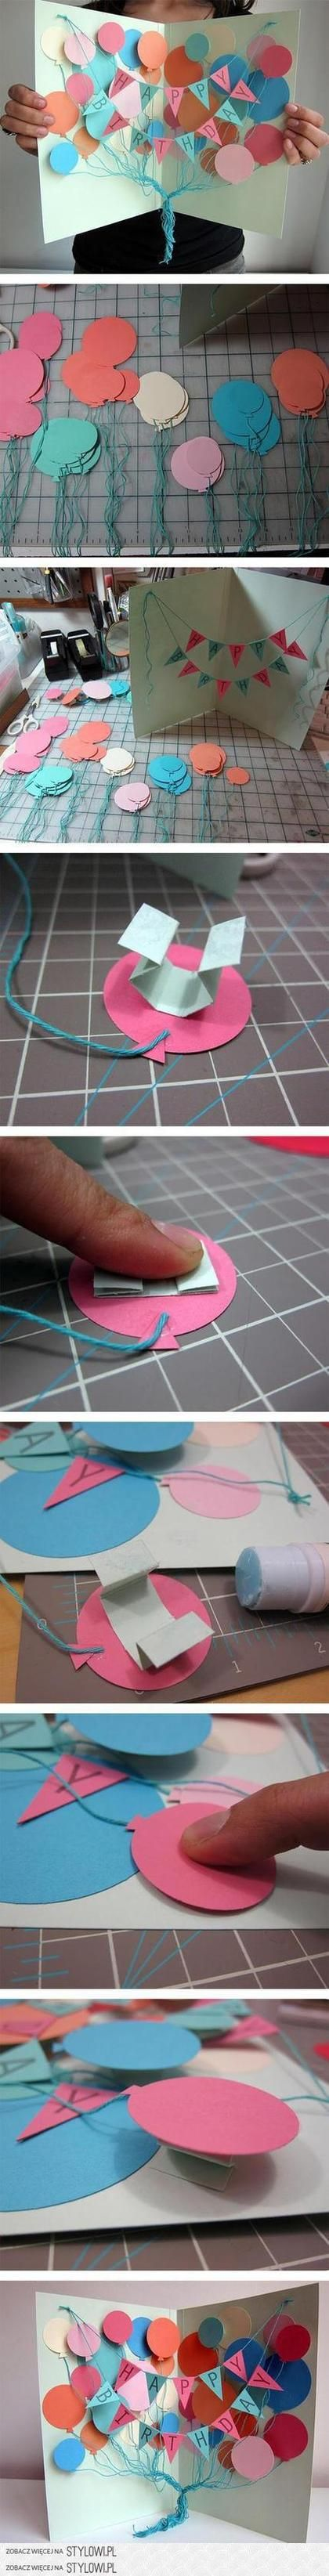 Great card idea #BirthdayCards